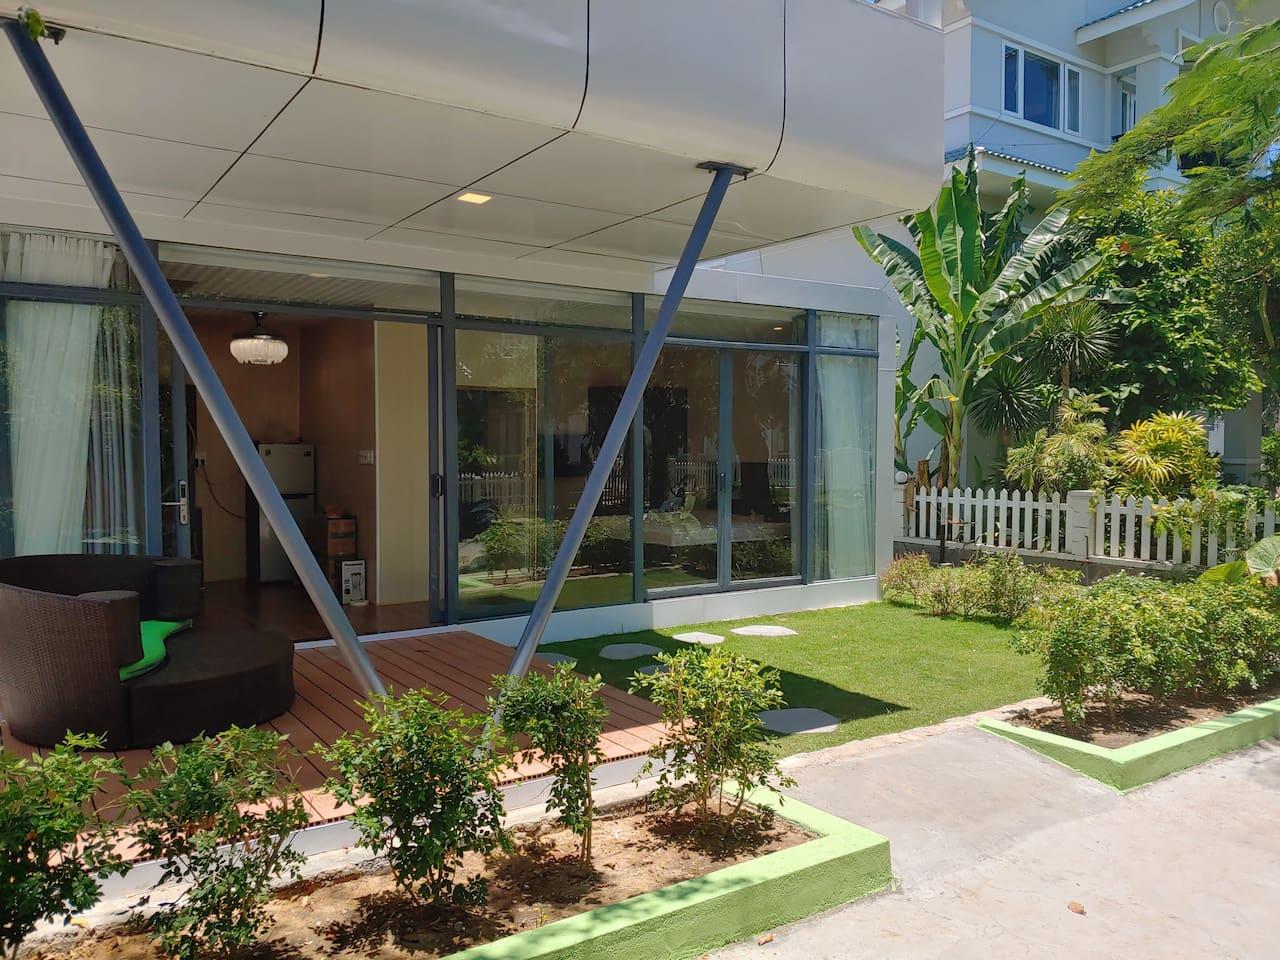 Villa's image